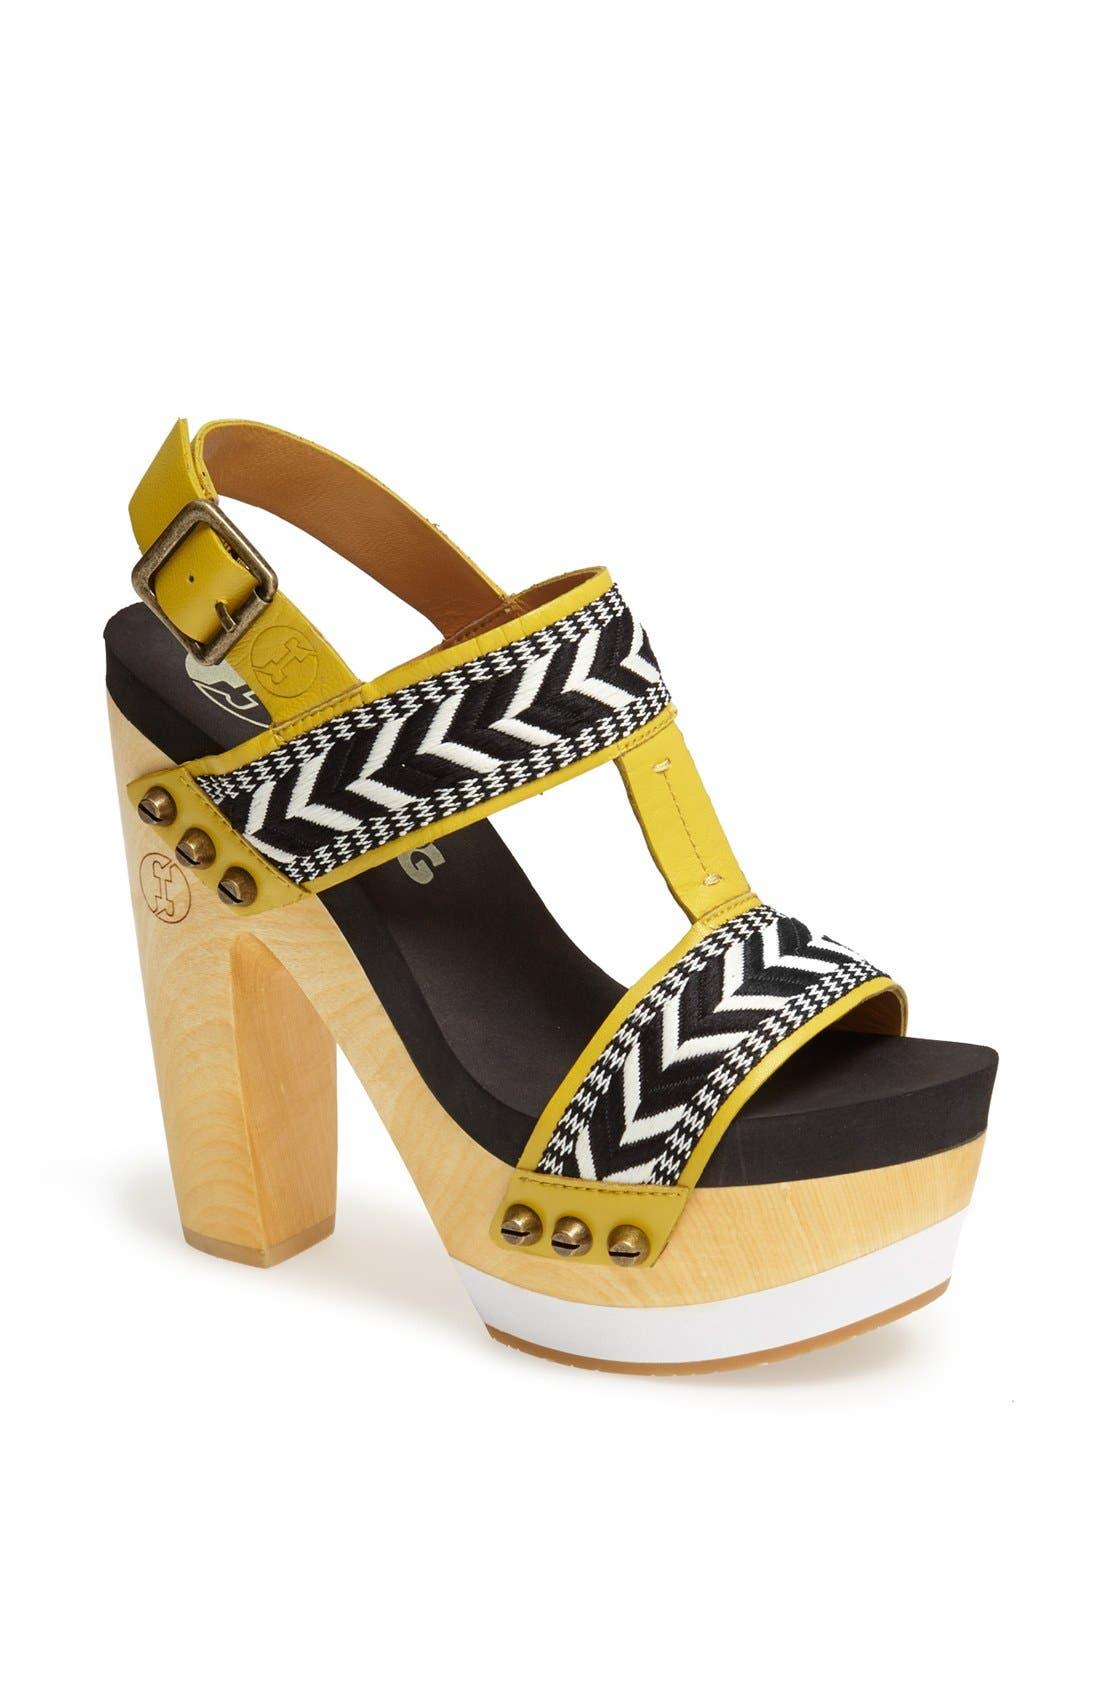 Main Image - Flogg 'Risky' Platform Sandal